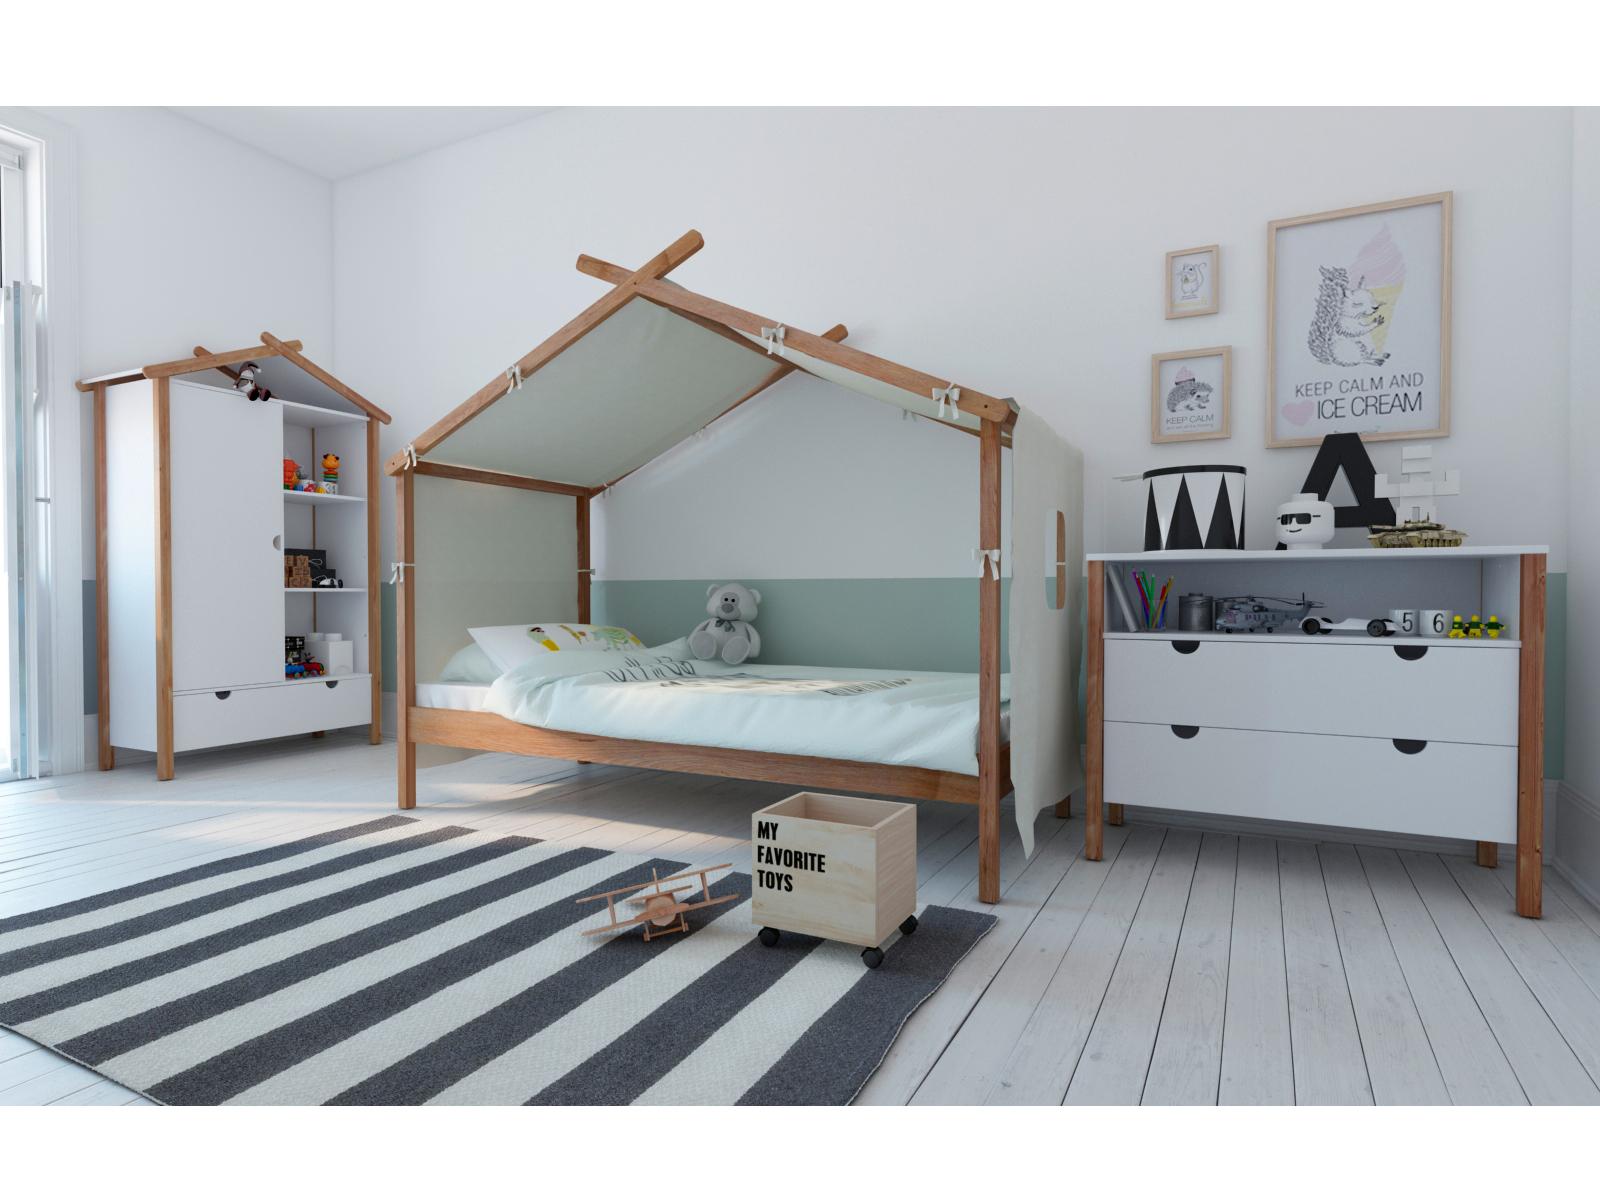 emili kinderbett 90x200 cm kiefer massiv weiss. Black Bedroom Furniture Sets. Home Design Ideas